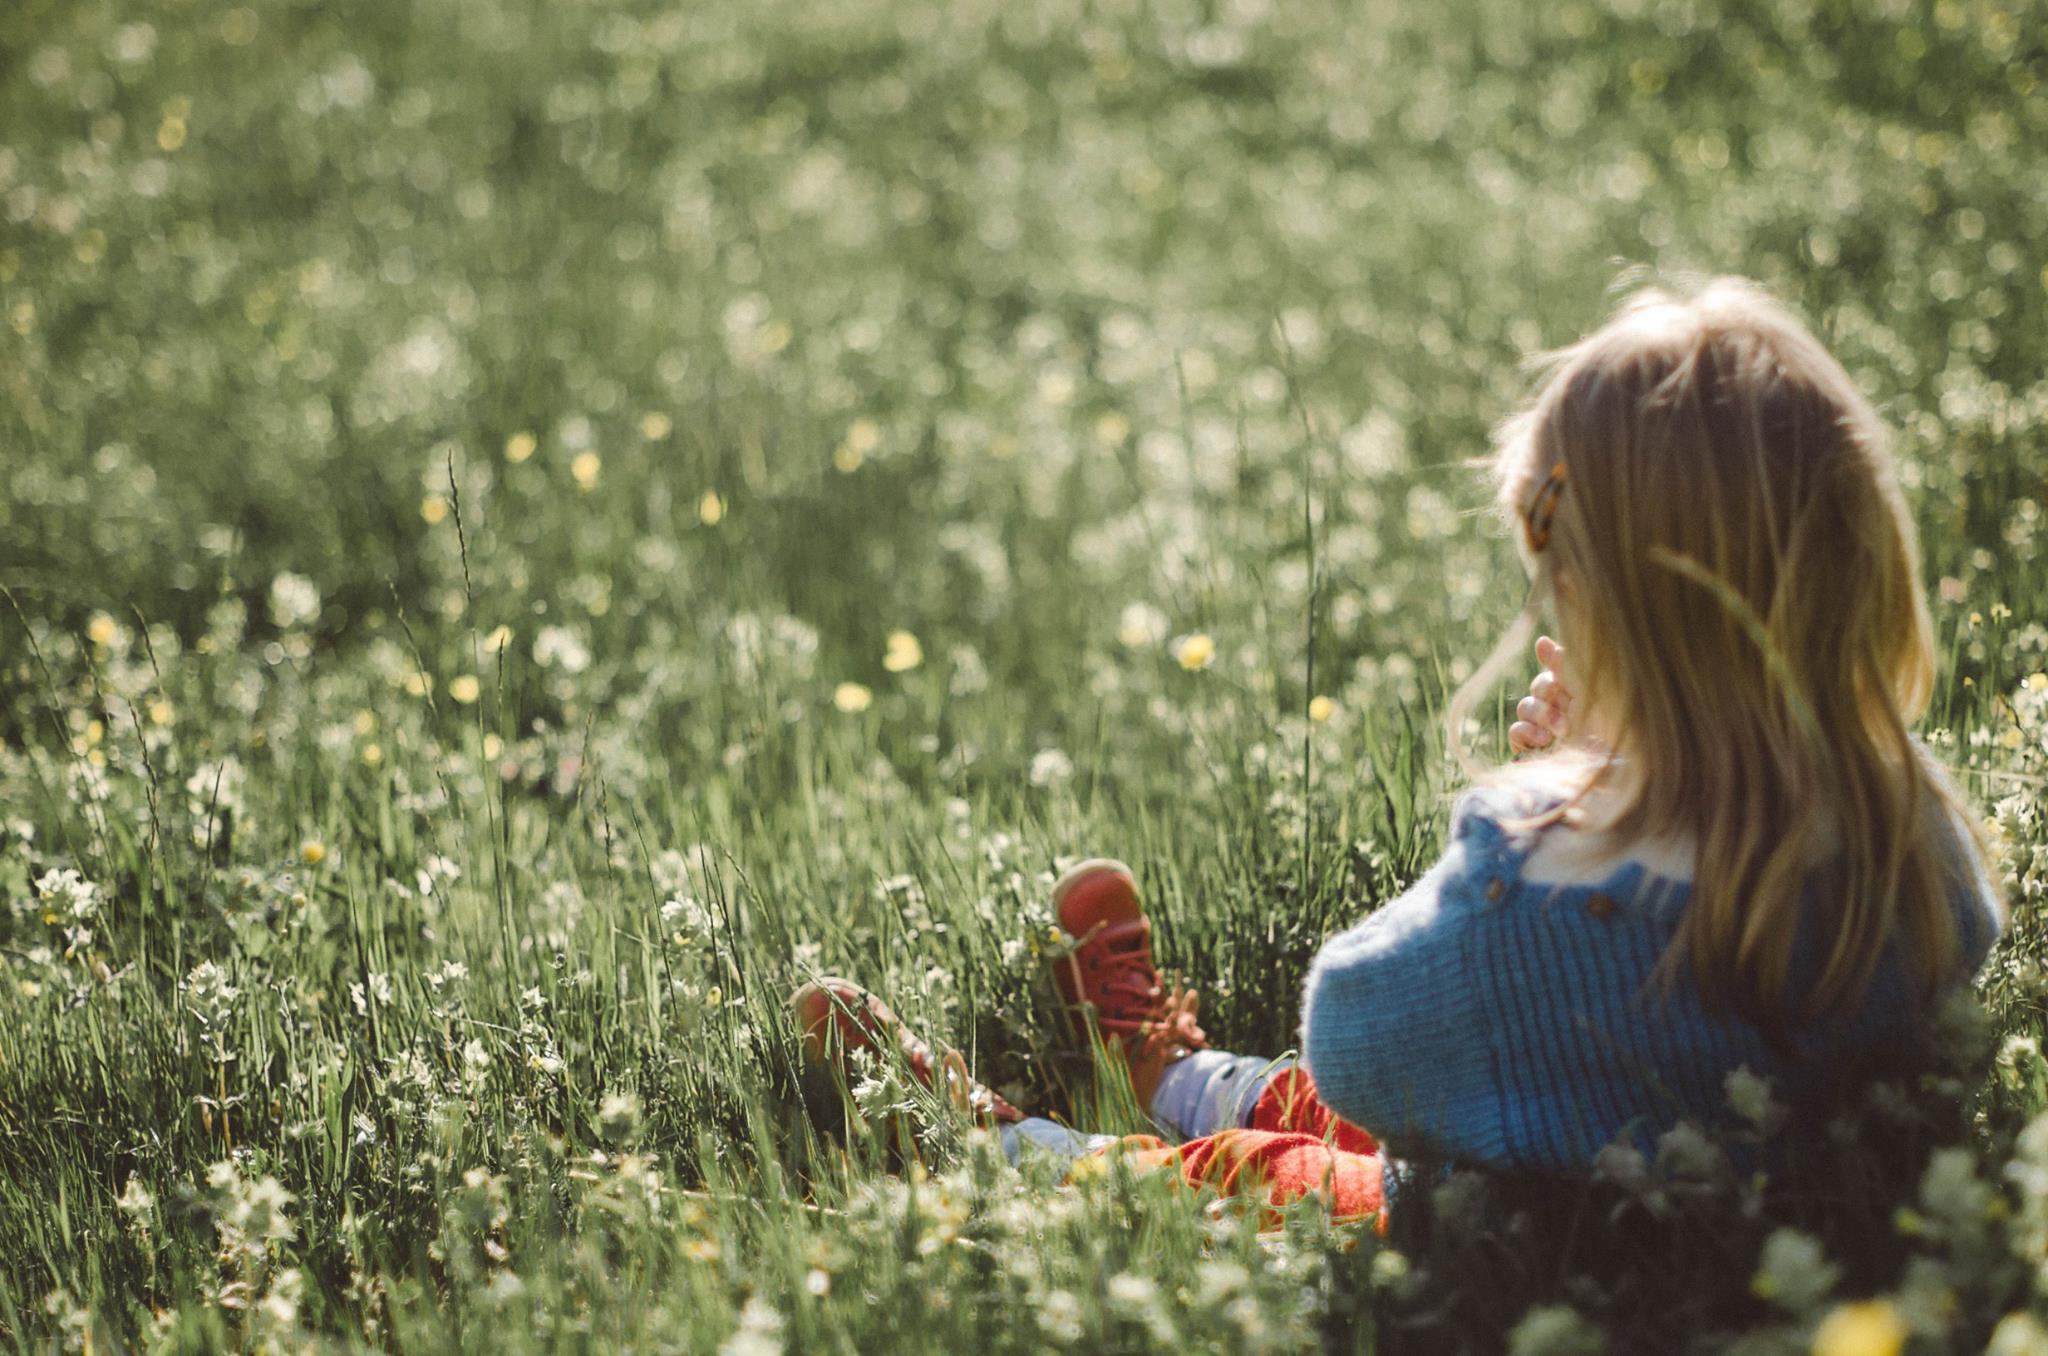 Kinderfotoshooting im Freien